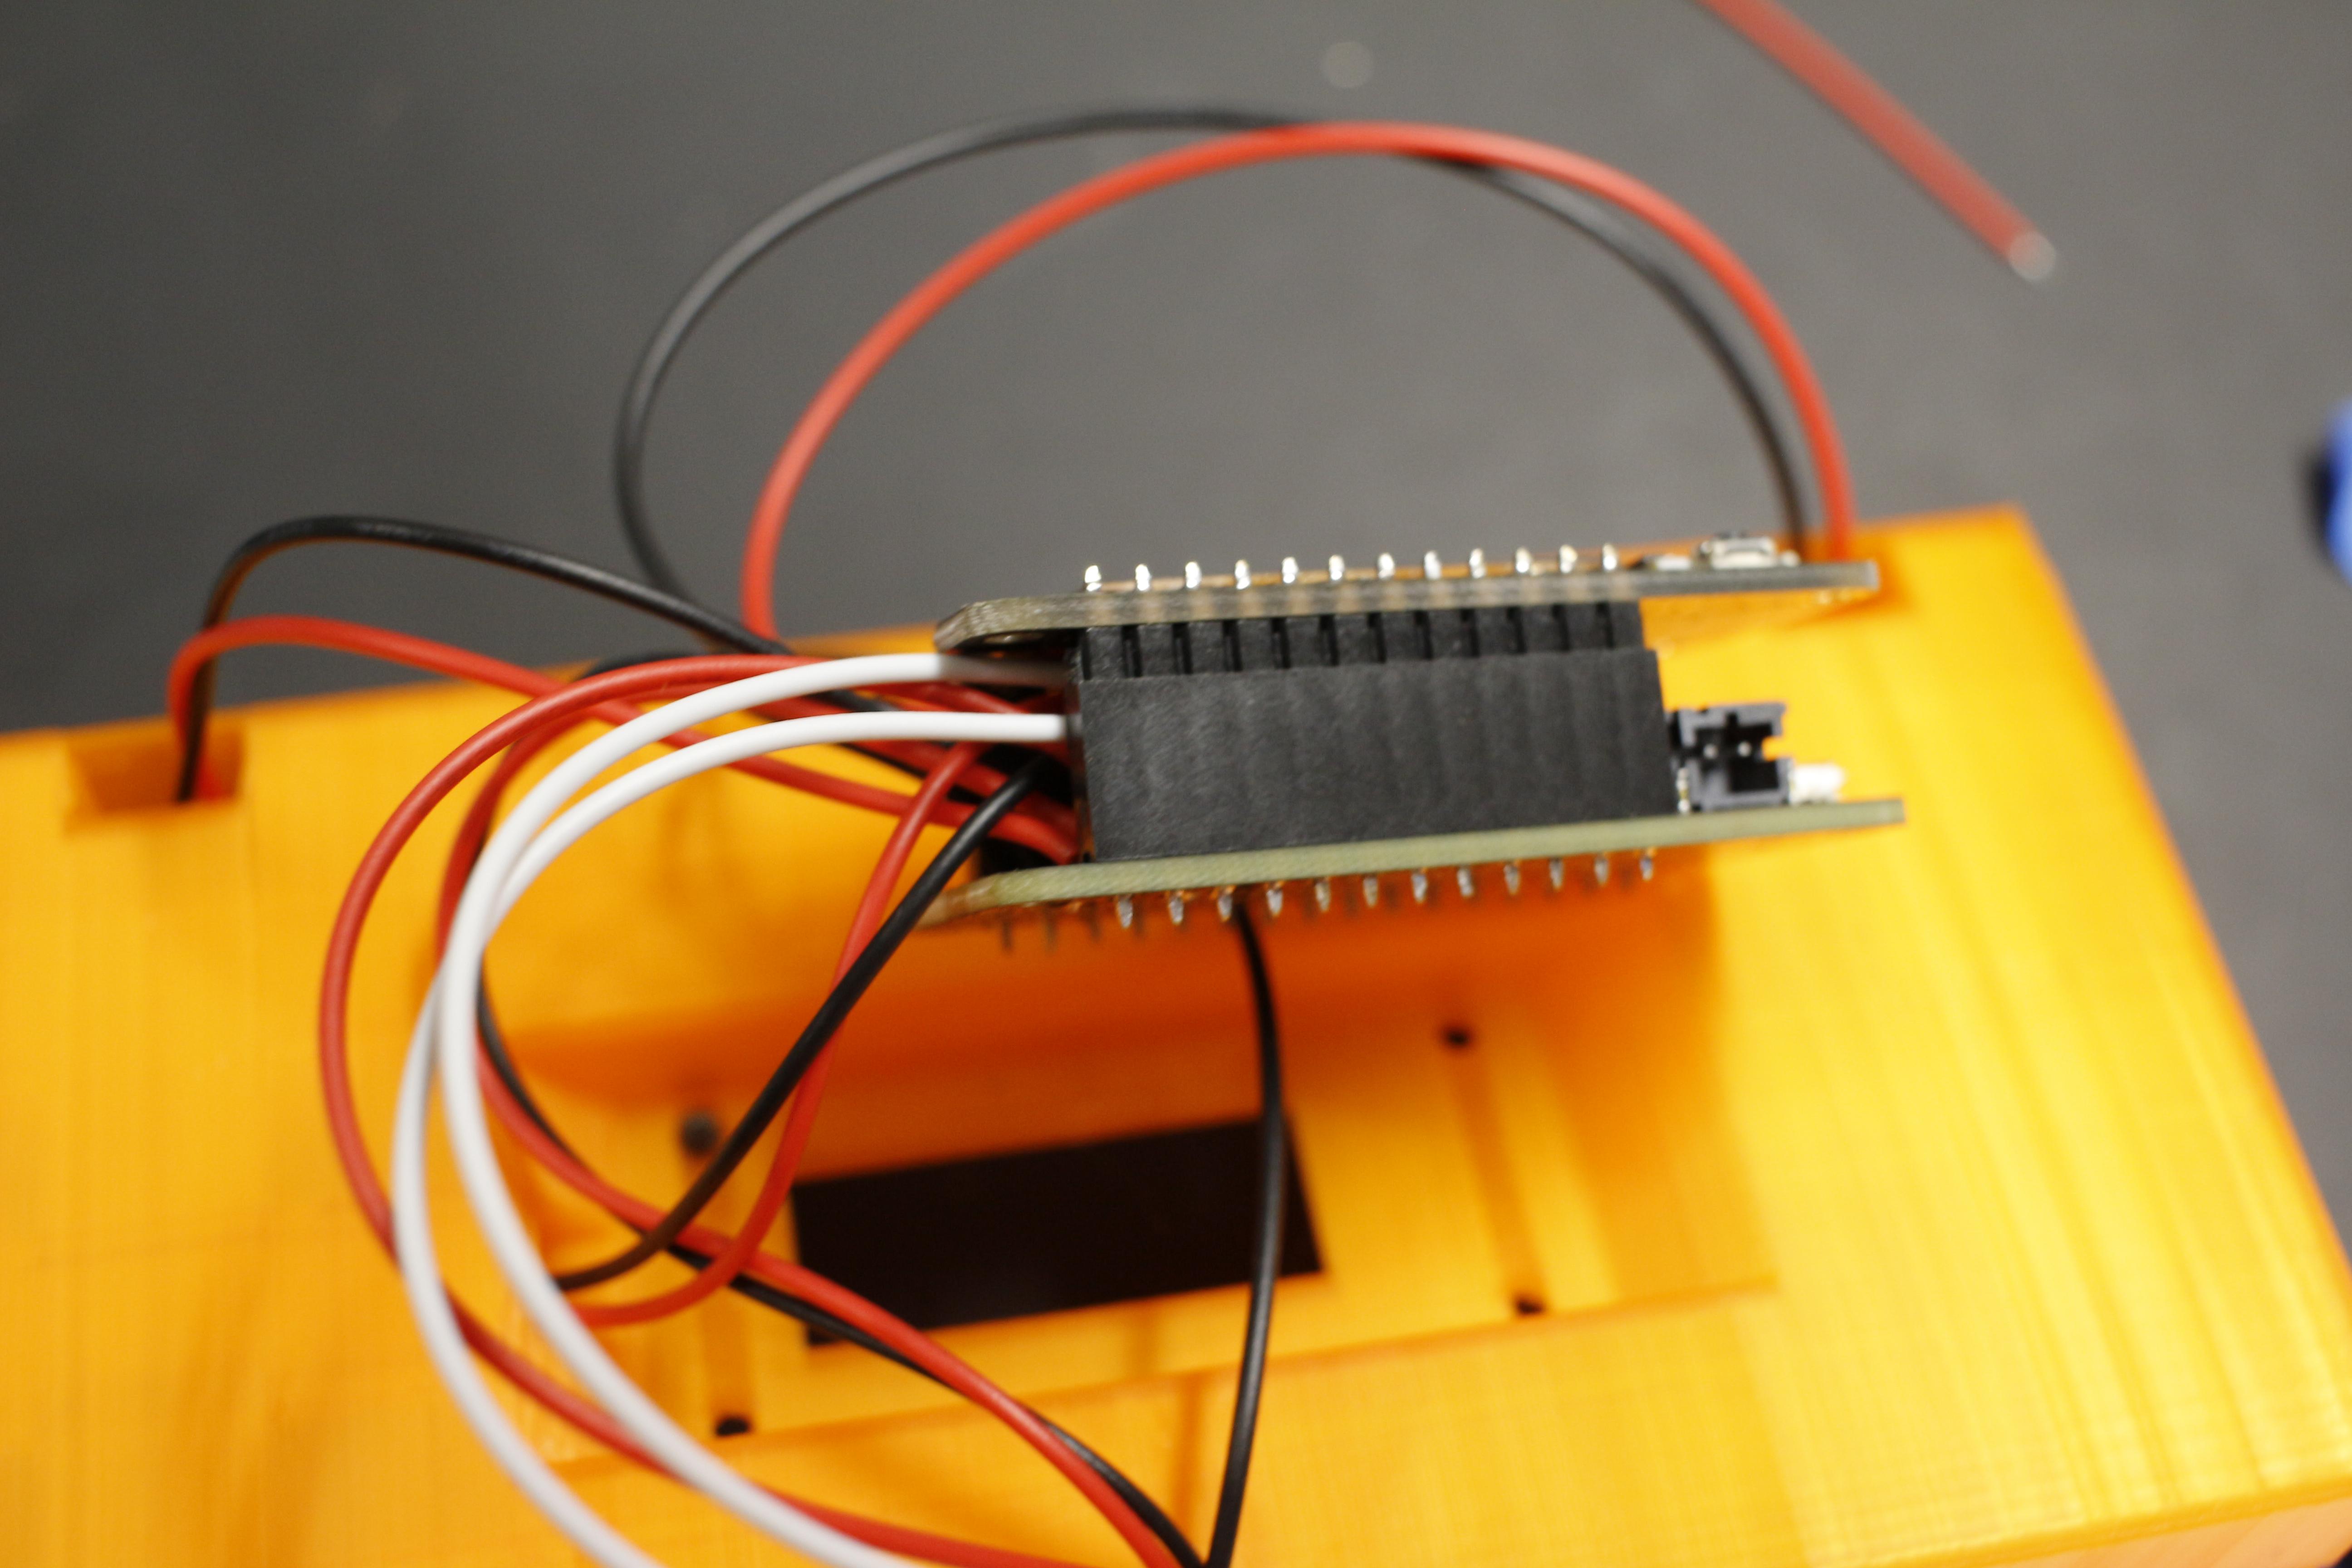 sensors__MG_9710.jpg